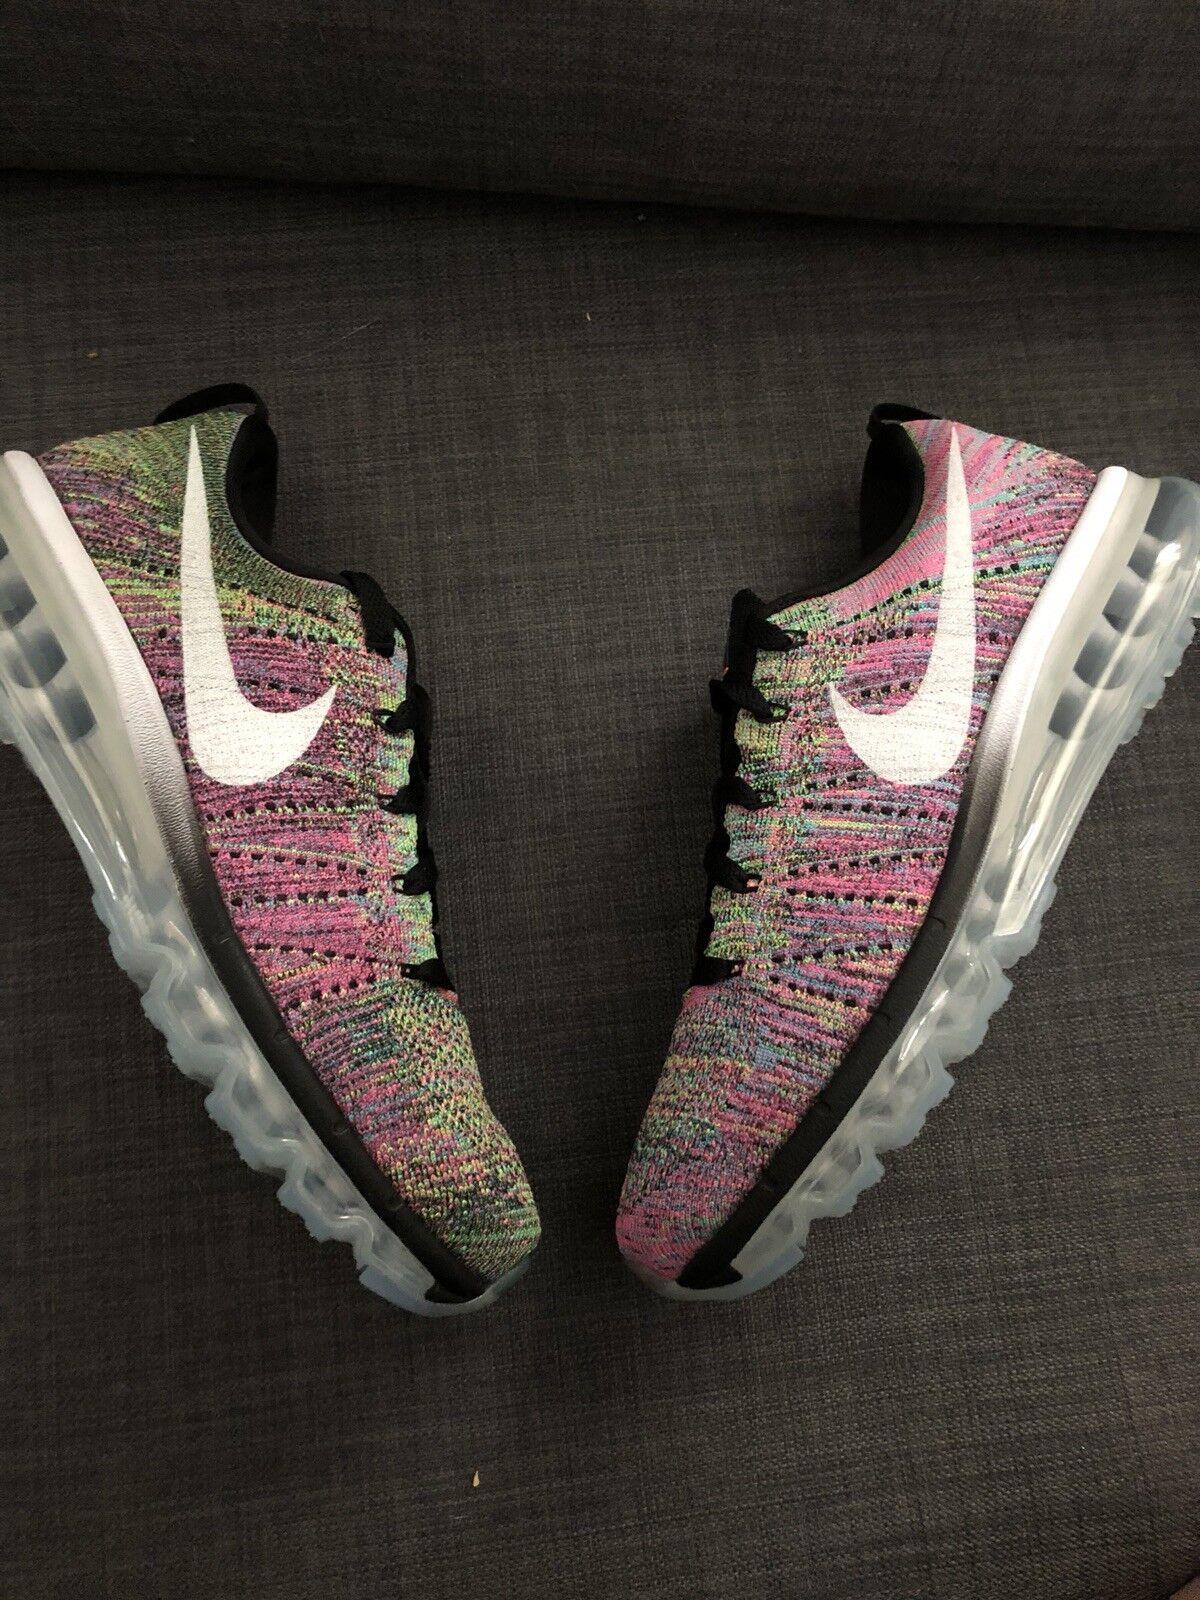 Nike Air Max Flyknit mc Multi color Pink vapor 620659-004 womens 9.5 Men 8 new